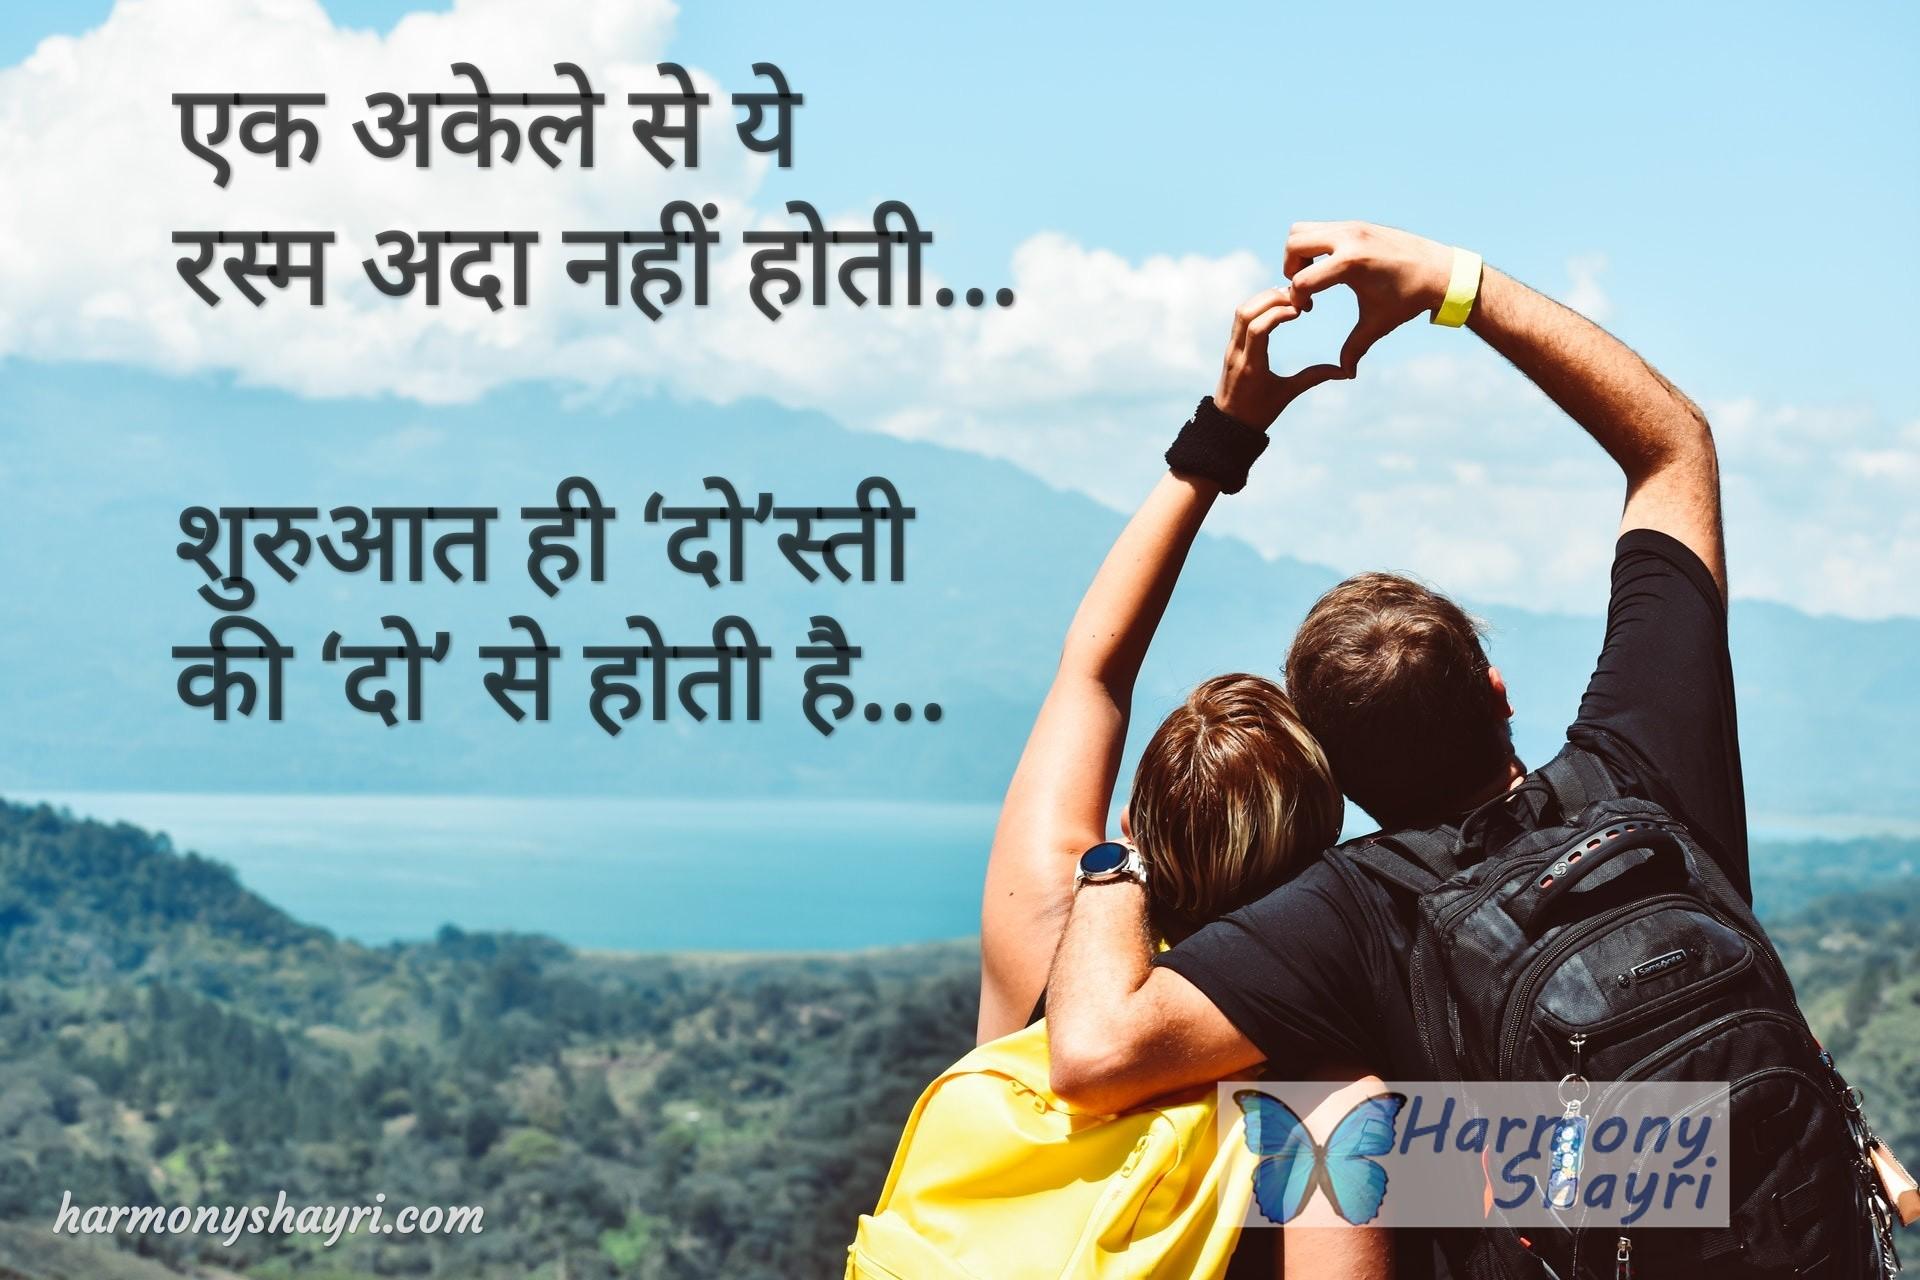 Ek akele se ye rasam ada nahi - Top Hindi Shayari Collection